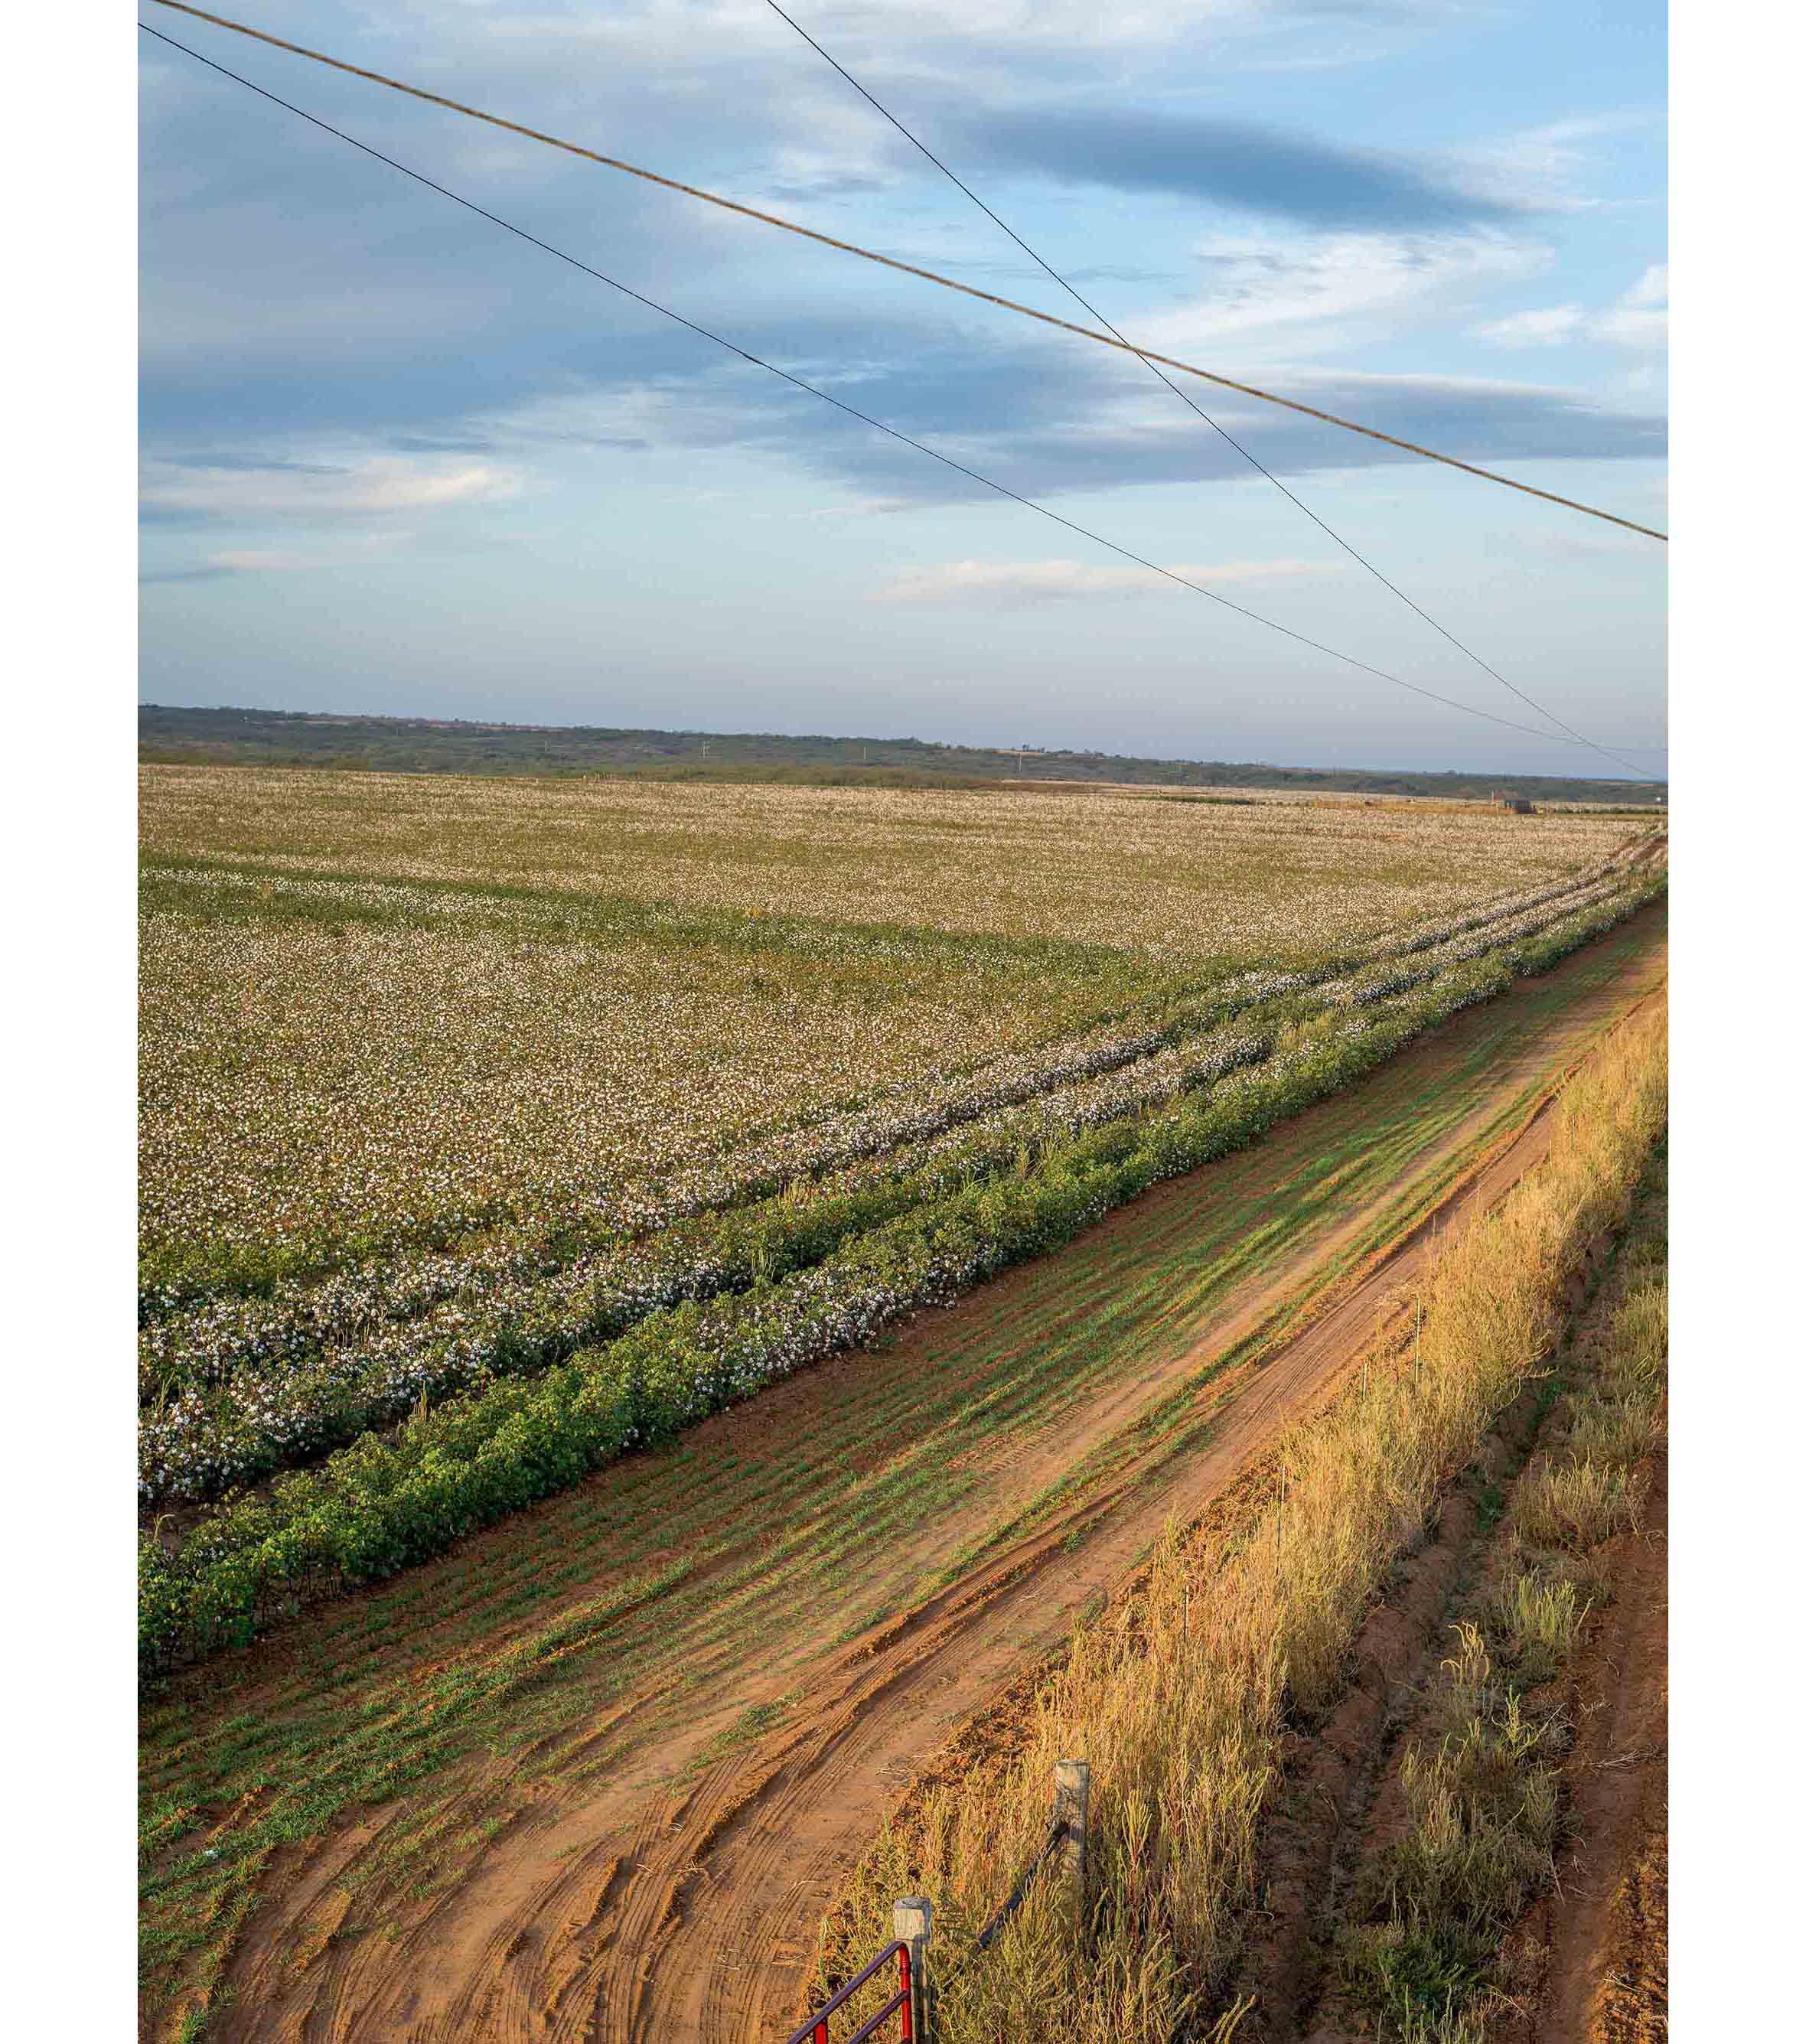 Cottonfields11.jpg